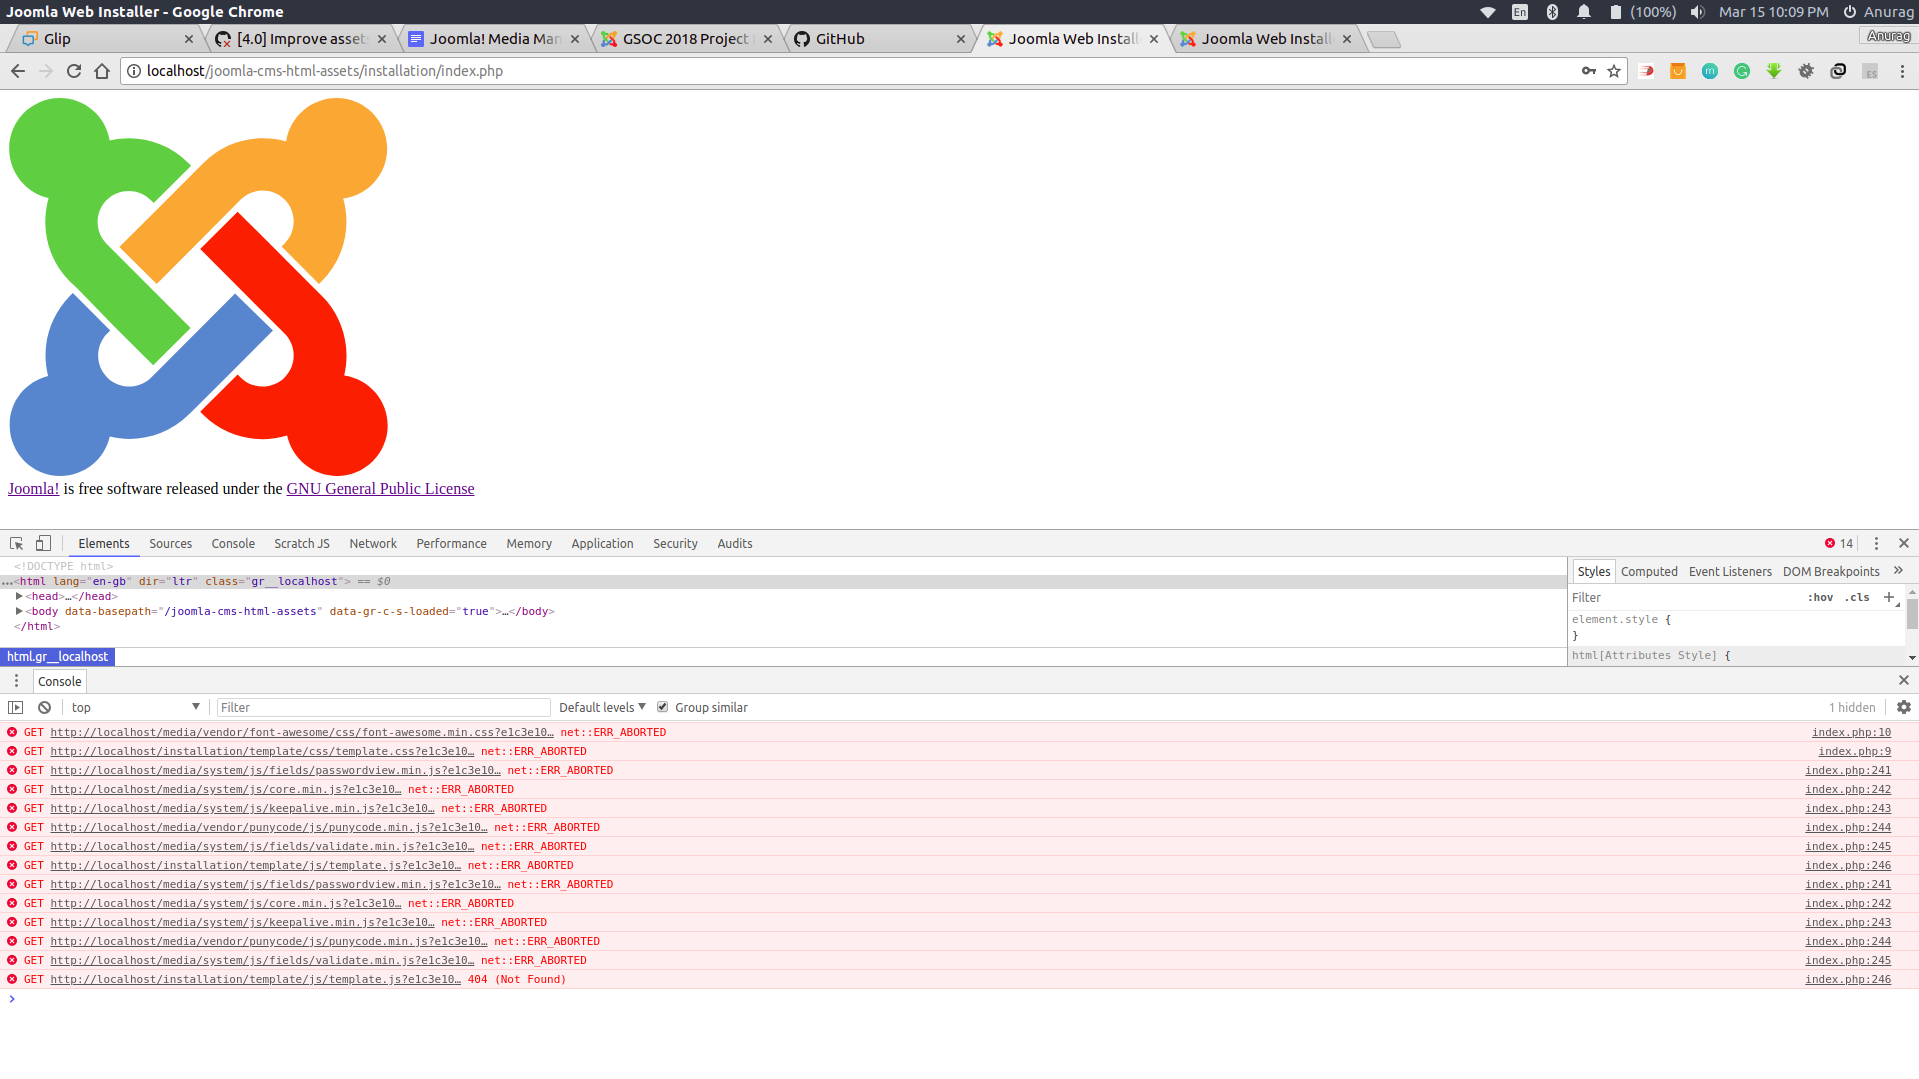 Joomla! Issue Tracker | Joomla! CMS #19744 - [4 0] Improve